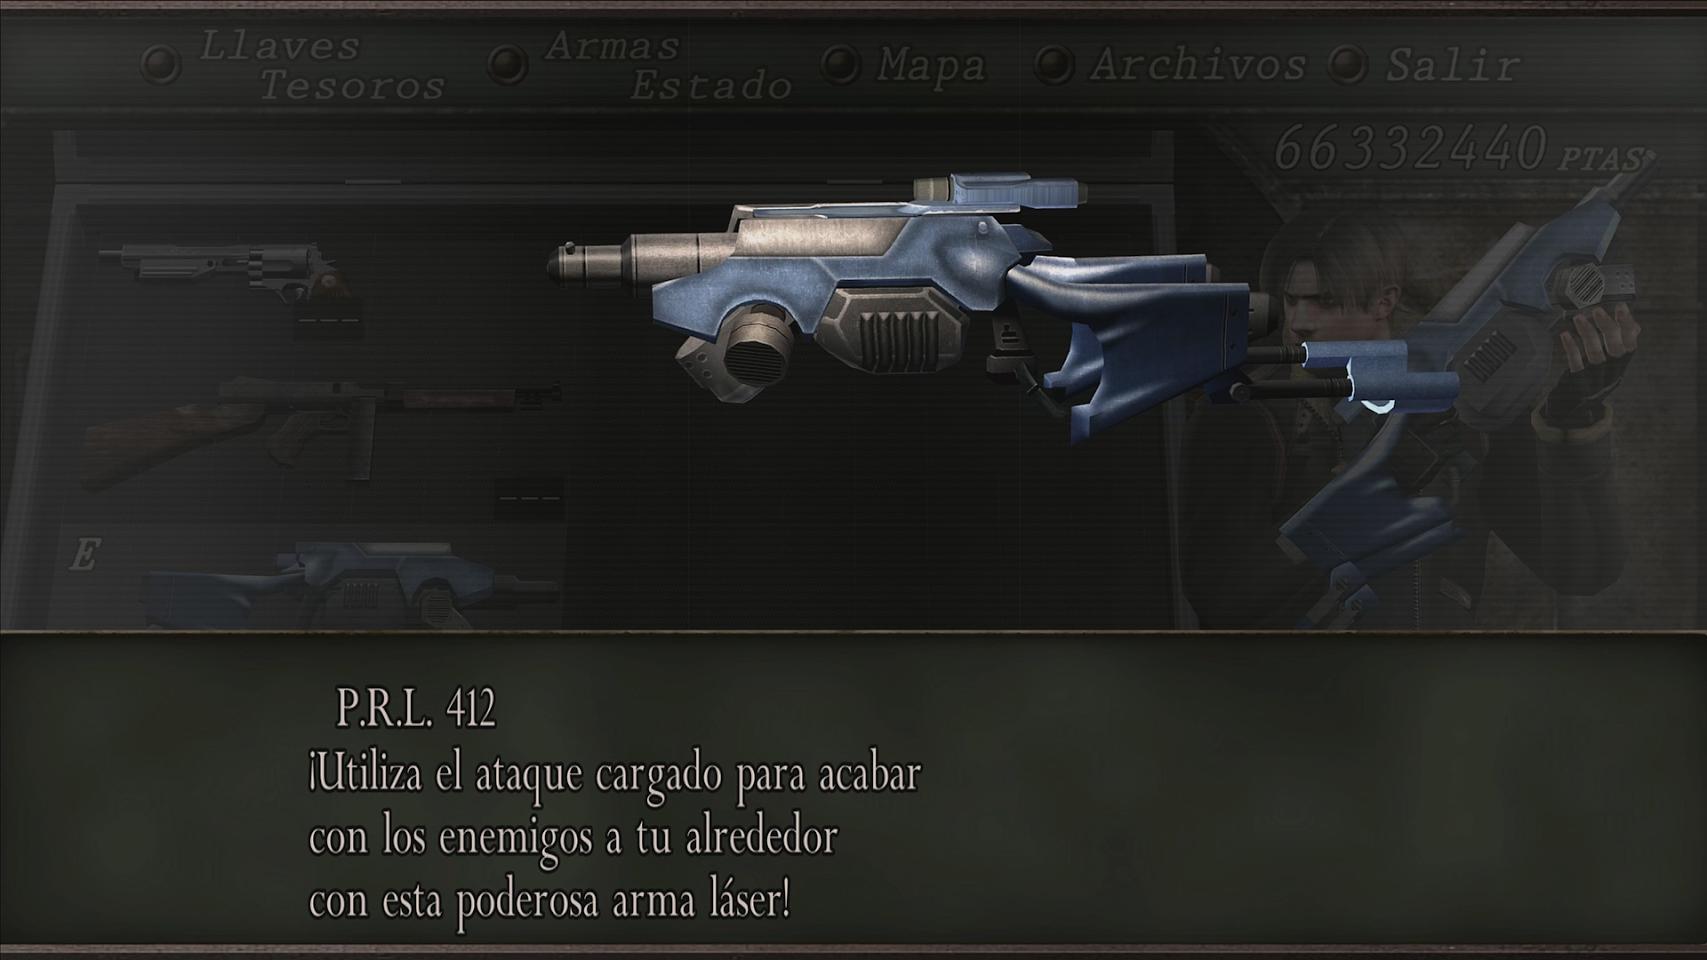 Ultimate HD Weapon Pack DmmRw4_xJ1az-2Uj6ULEsZunH9M7muXpQkcPfVNfSy6n6f71tlGUNTP05CKeClPa9LBEkvvfWguLi6cUykHT0rY6PVPrqksxmEwgxfFdRN-Z19I_BxrqiQyvDDKt3lD8FRly7Wy59-quNUJ7YlRv0wN2wIKyD95EU31XebEqUo7w-LXGBgrPy9hD-oGsYLDeYSC5rhAnT4BcOMyQUqjjpiSsYl47pUcaSrmorUqAhPZpKrOPzJr7k_WzEbgfpr_-HCJDF4Q-m4dUWquGa9CMxmoXH75nR3XjW5z1-f8d69Cj1Btv5d_bh-vsvvaFEdK_kPREkIQjXjCMdzS3zMkOjYhlTOxonx2VywhDM1dSx-qiWjrm8if4Yhhh0kcVZYILhwuCGwExDDWpqb2z_HfvKW4pJ5aNiCKh-OQlAEj4J7P6FqCaTZAzlgCmclKkApOJ6FdMmQLxOF2OhTeyyVKB3obMmLJb0_gwlpQgU4A8j6LXIMBo8ZXyYg4FY1WgCUowWfYhNdoJhUSA8FZBTamzIvkO0JymzO-tF7oaCdYP2nRa4rCk1tM9Xc3p7Z2eLlyZYLd1e7thppR5D_Z7LrrIVfqmiU-csUrdt6ZQmIcG7usLB6FN=w1707-h960-no